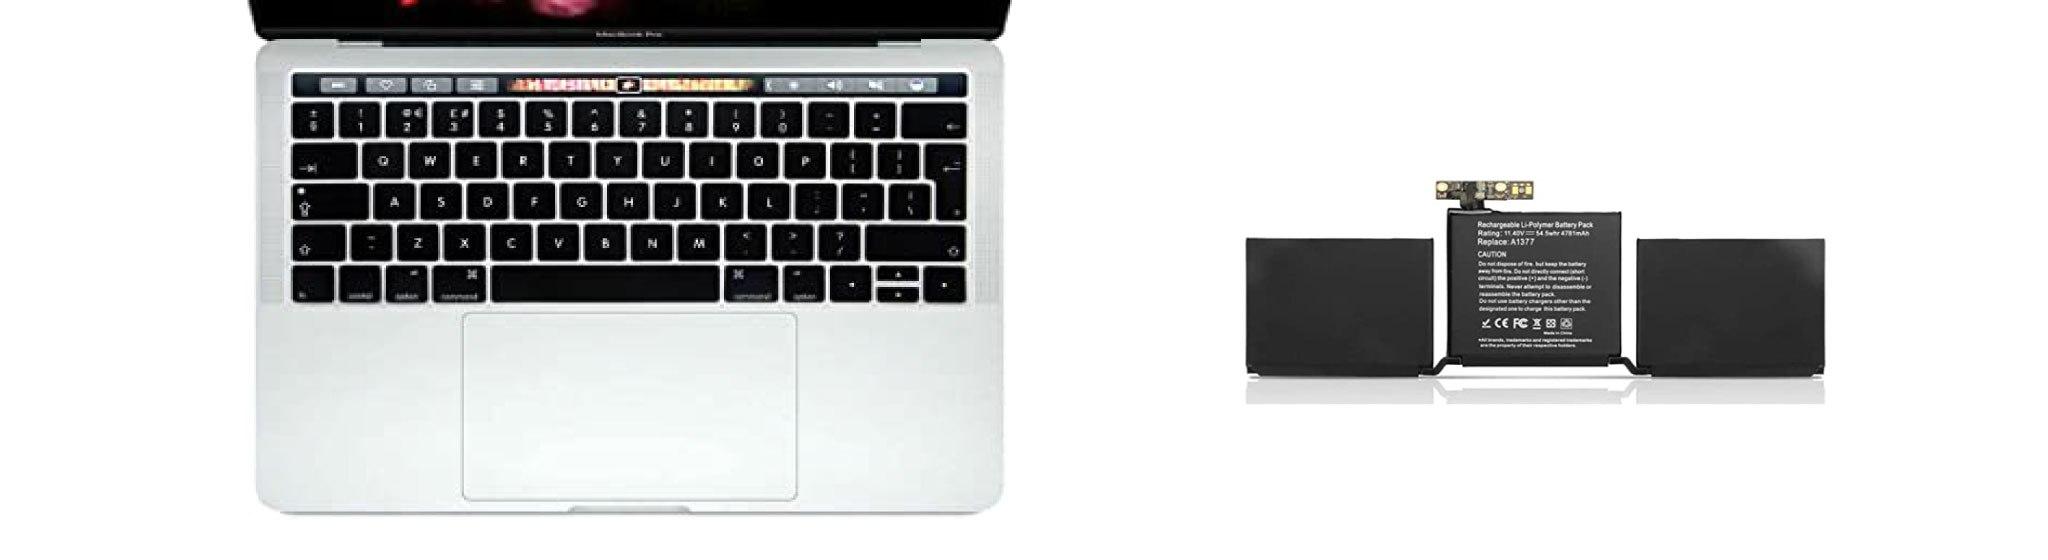 Expert Mac Repair Service - MacBook Battery Replacement Service lewisville